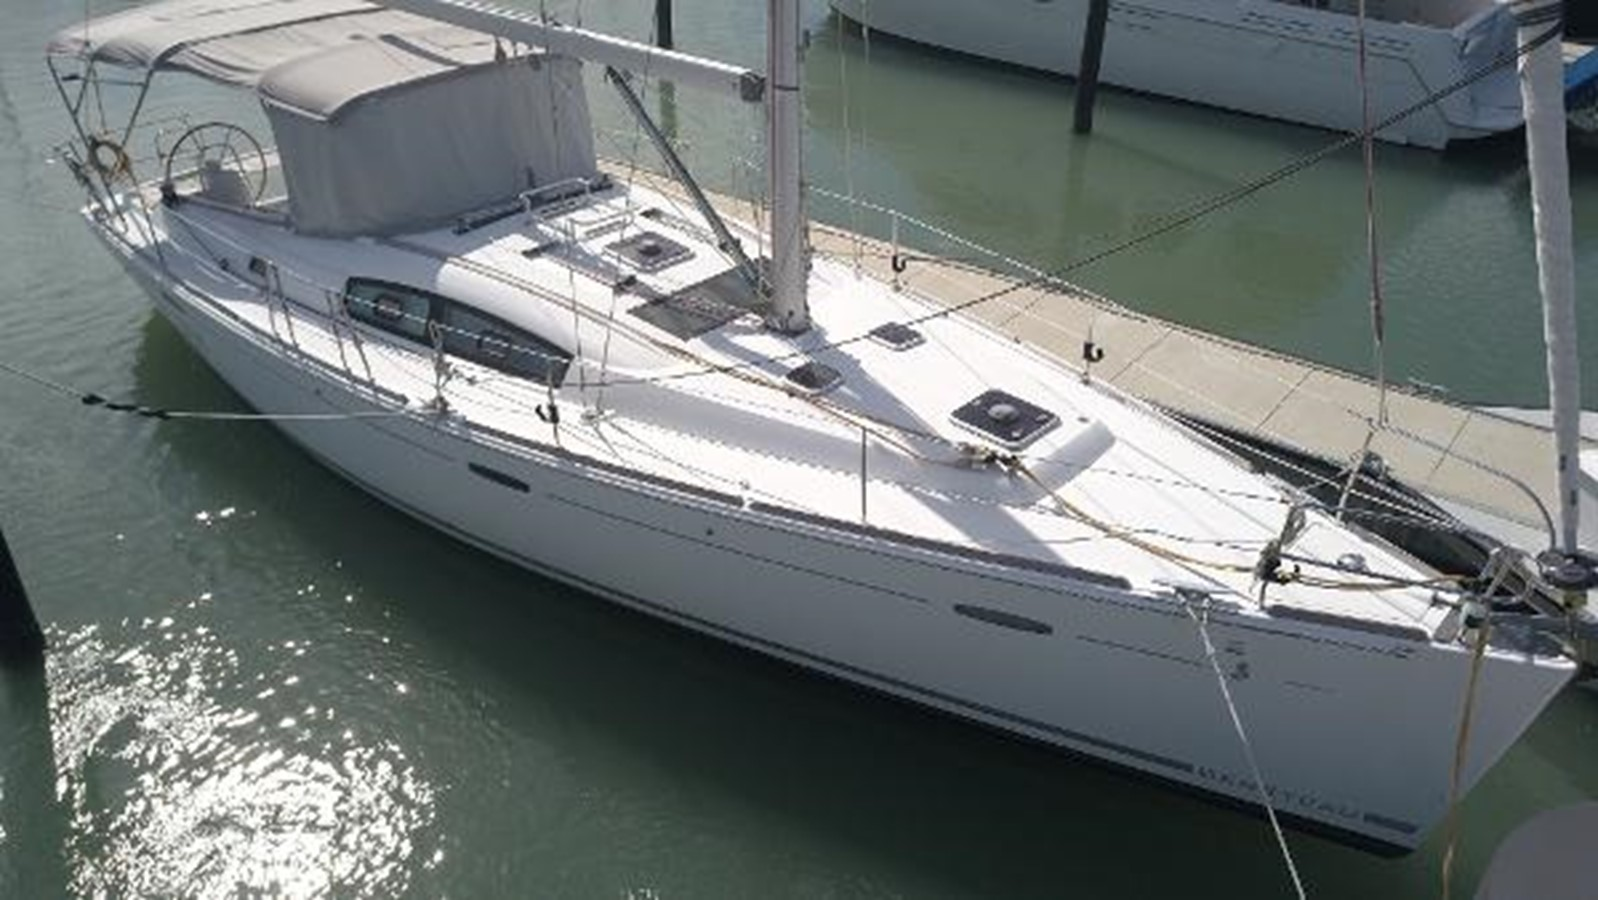 2008 BENETEAU Model Oceanis 43 Classic Yacht 2687115